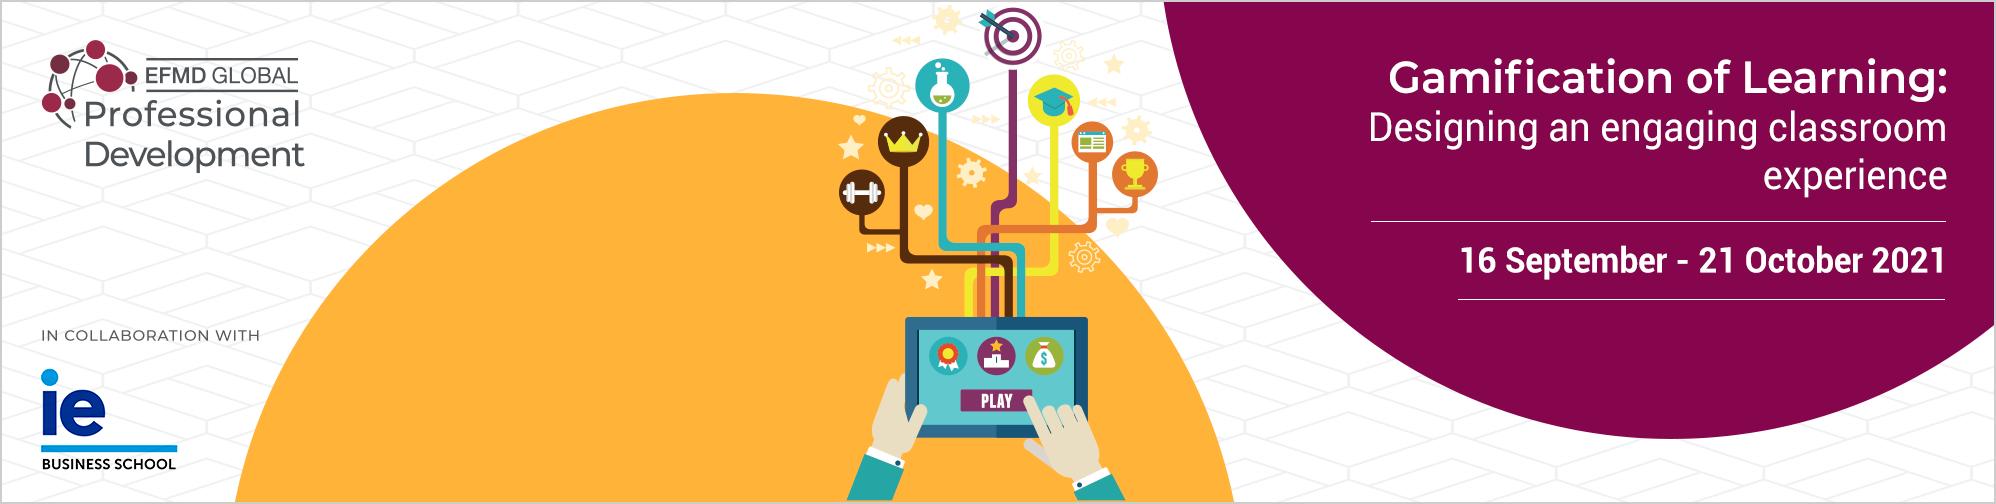 2021-EFMD-Gamification-of-Learning-website-3